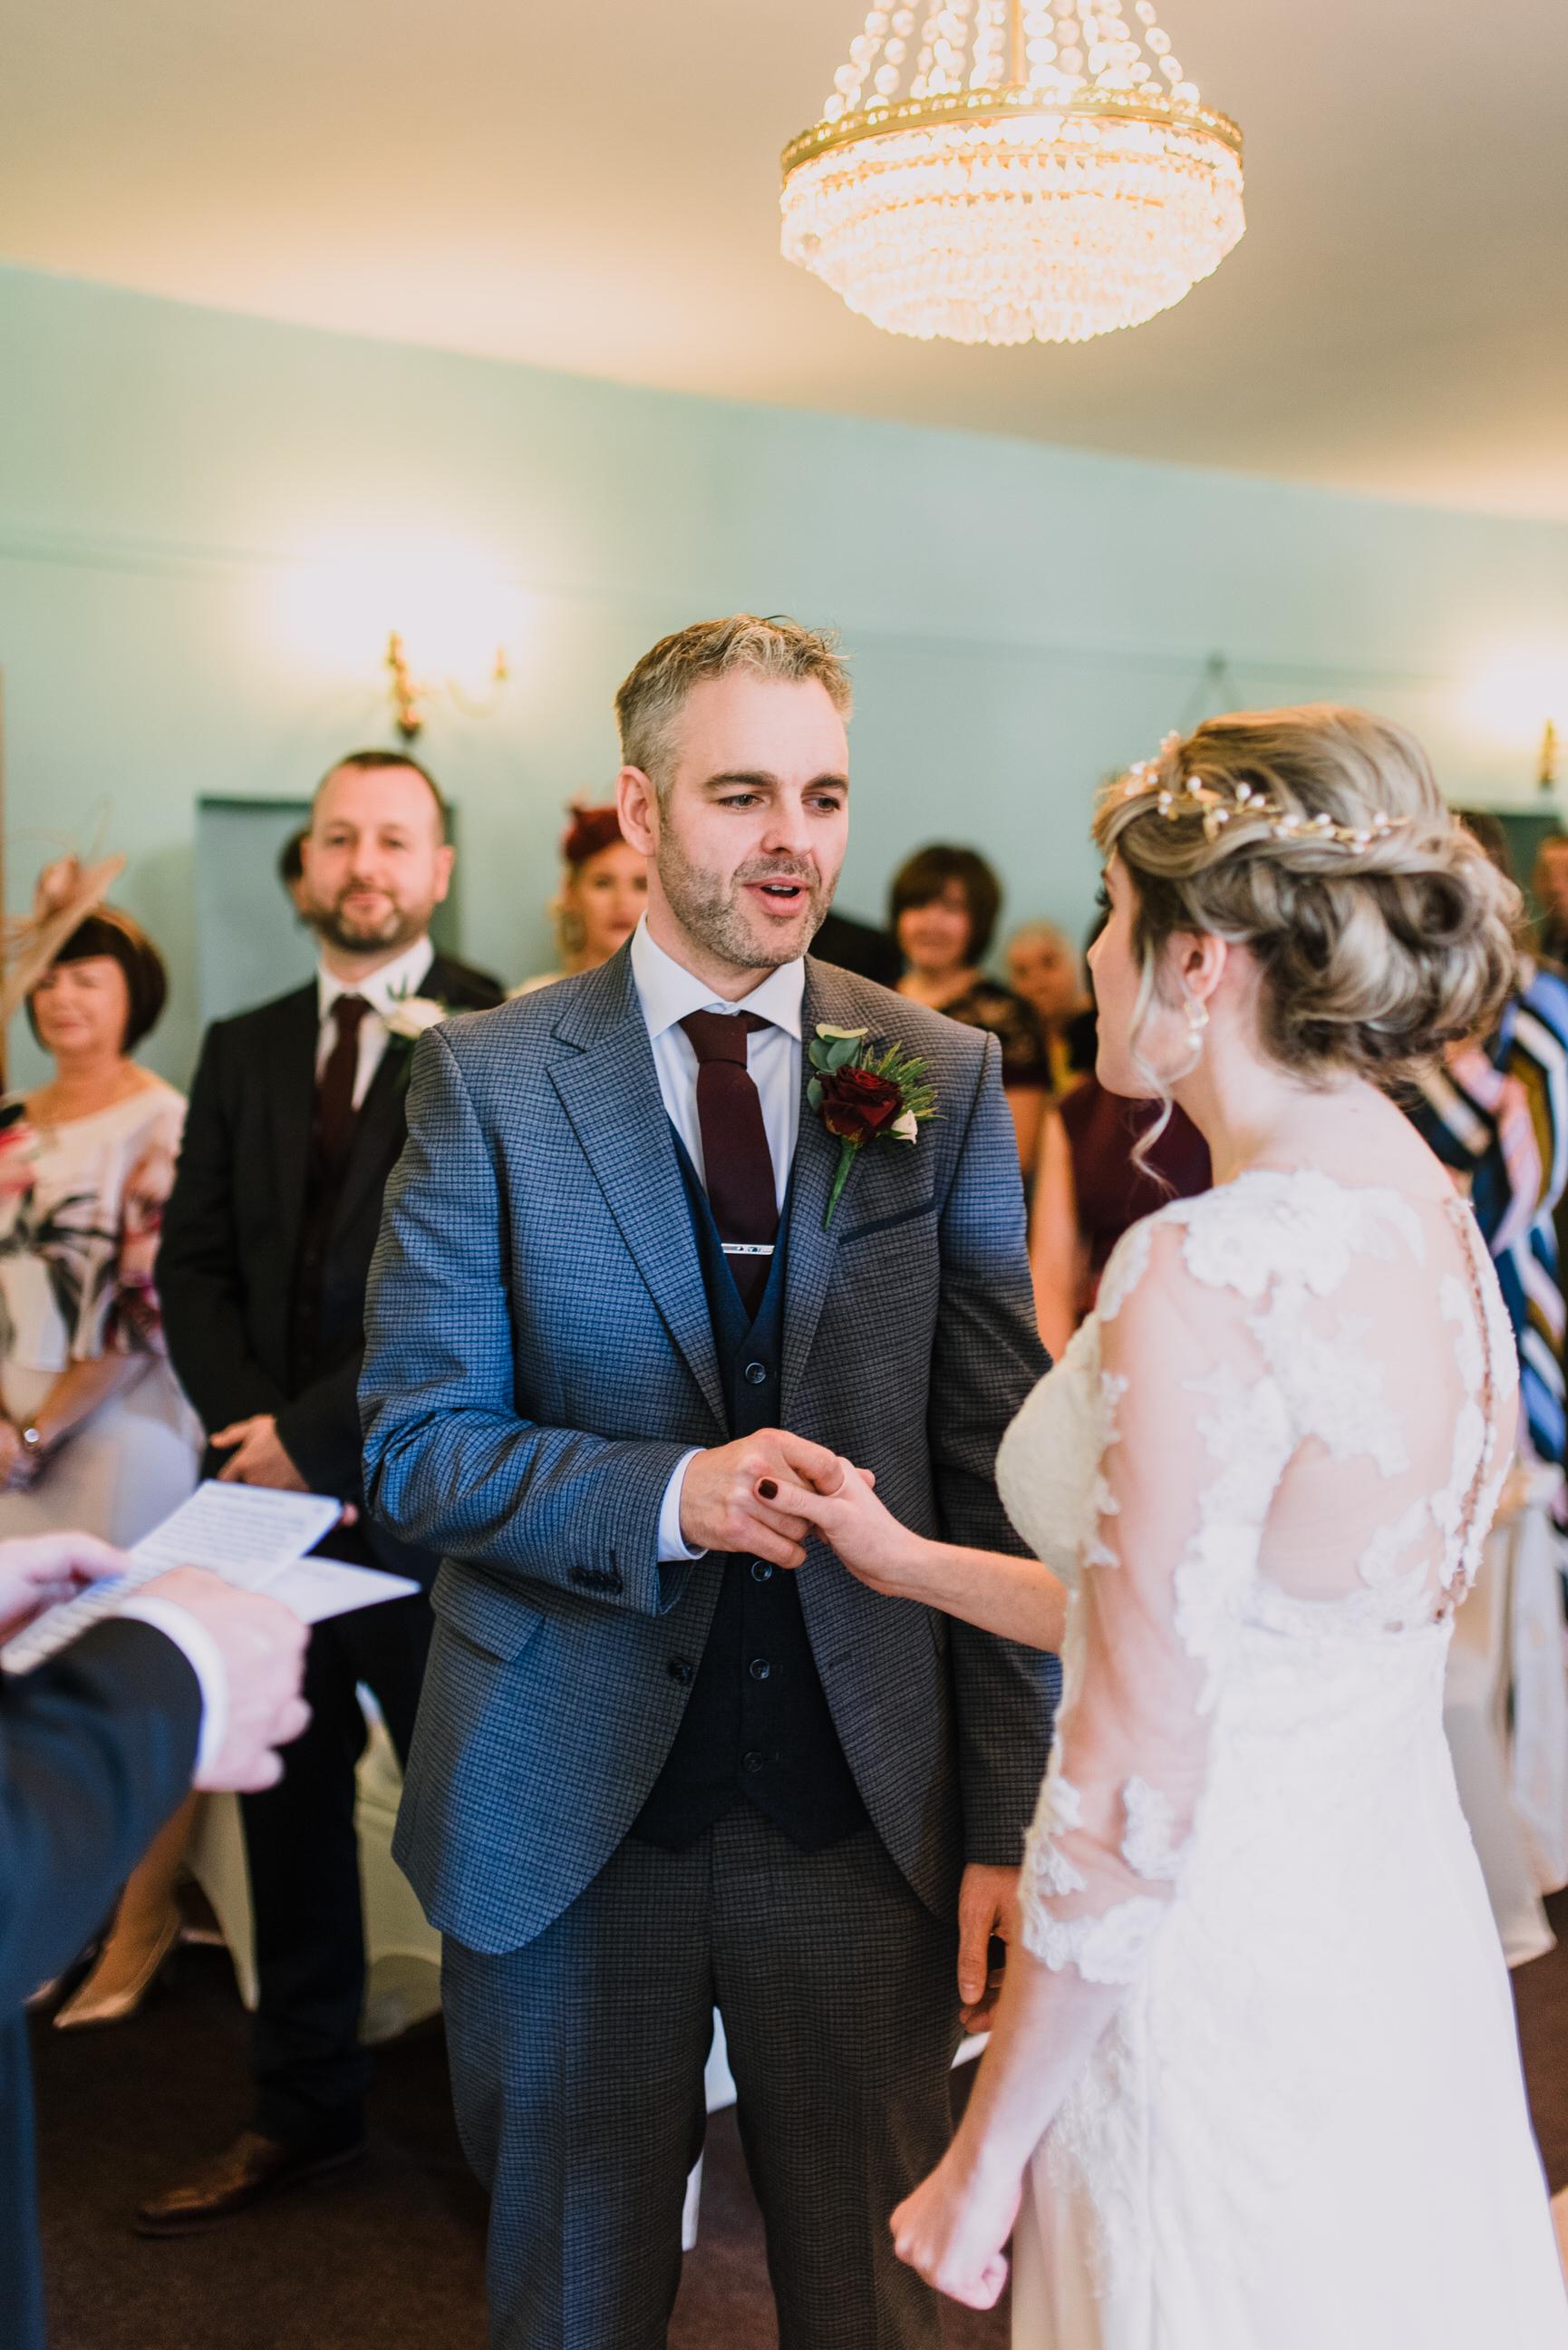 lissanoure castle wedding, northern ireland wedding photographer, romantic northern irish wedding venue, castle wedding ireland, natural wedding photography ni (53).jpg